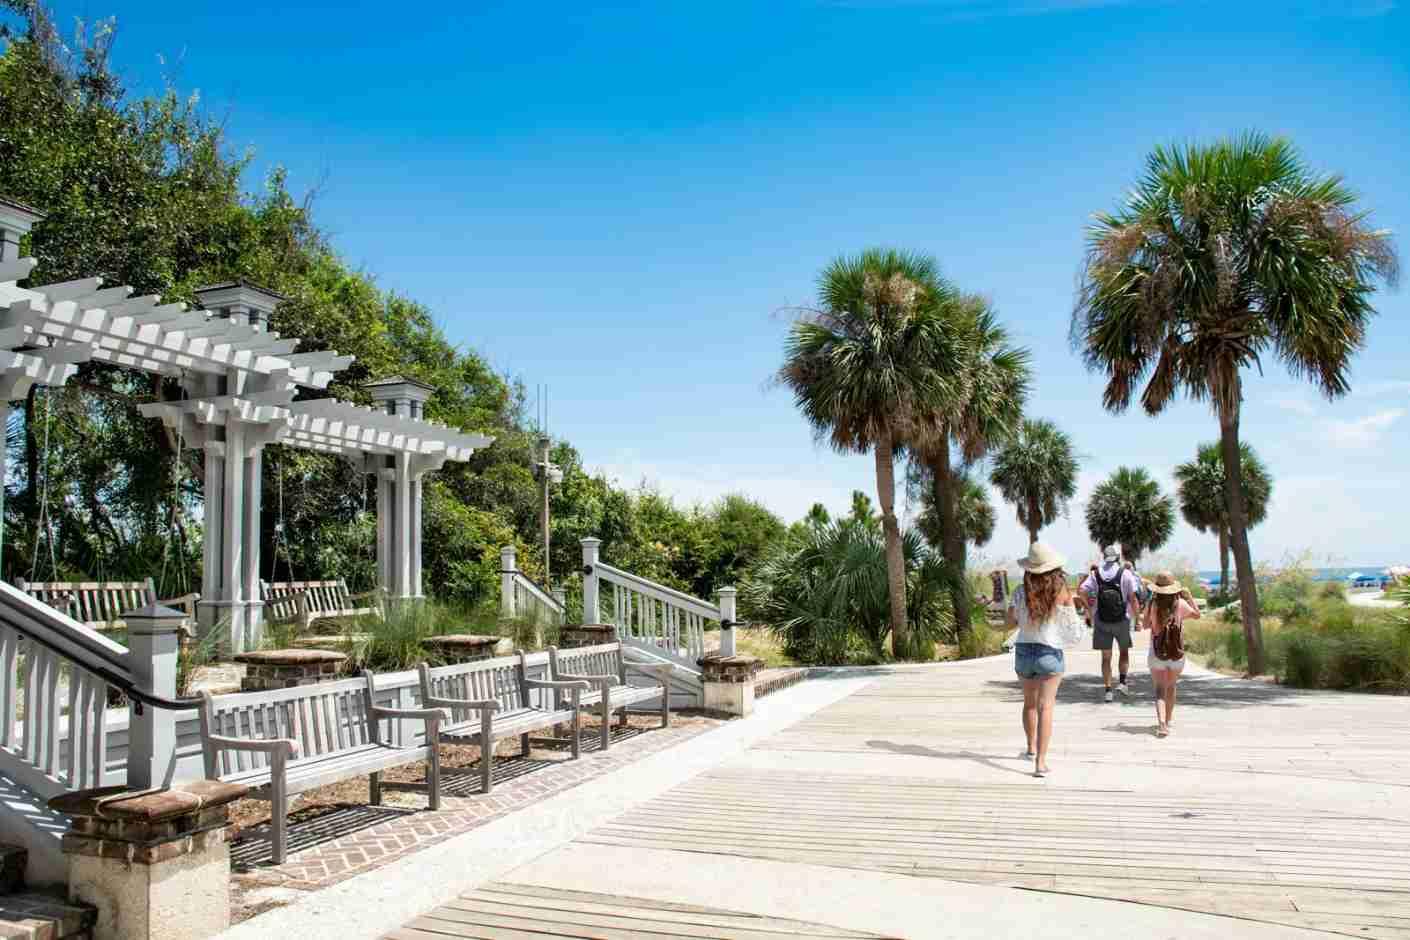 Coligny Beach Park on Hilton Head Island. (Photo via Getty Images)